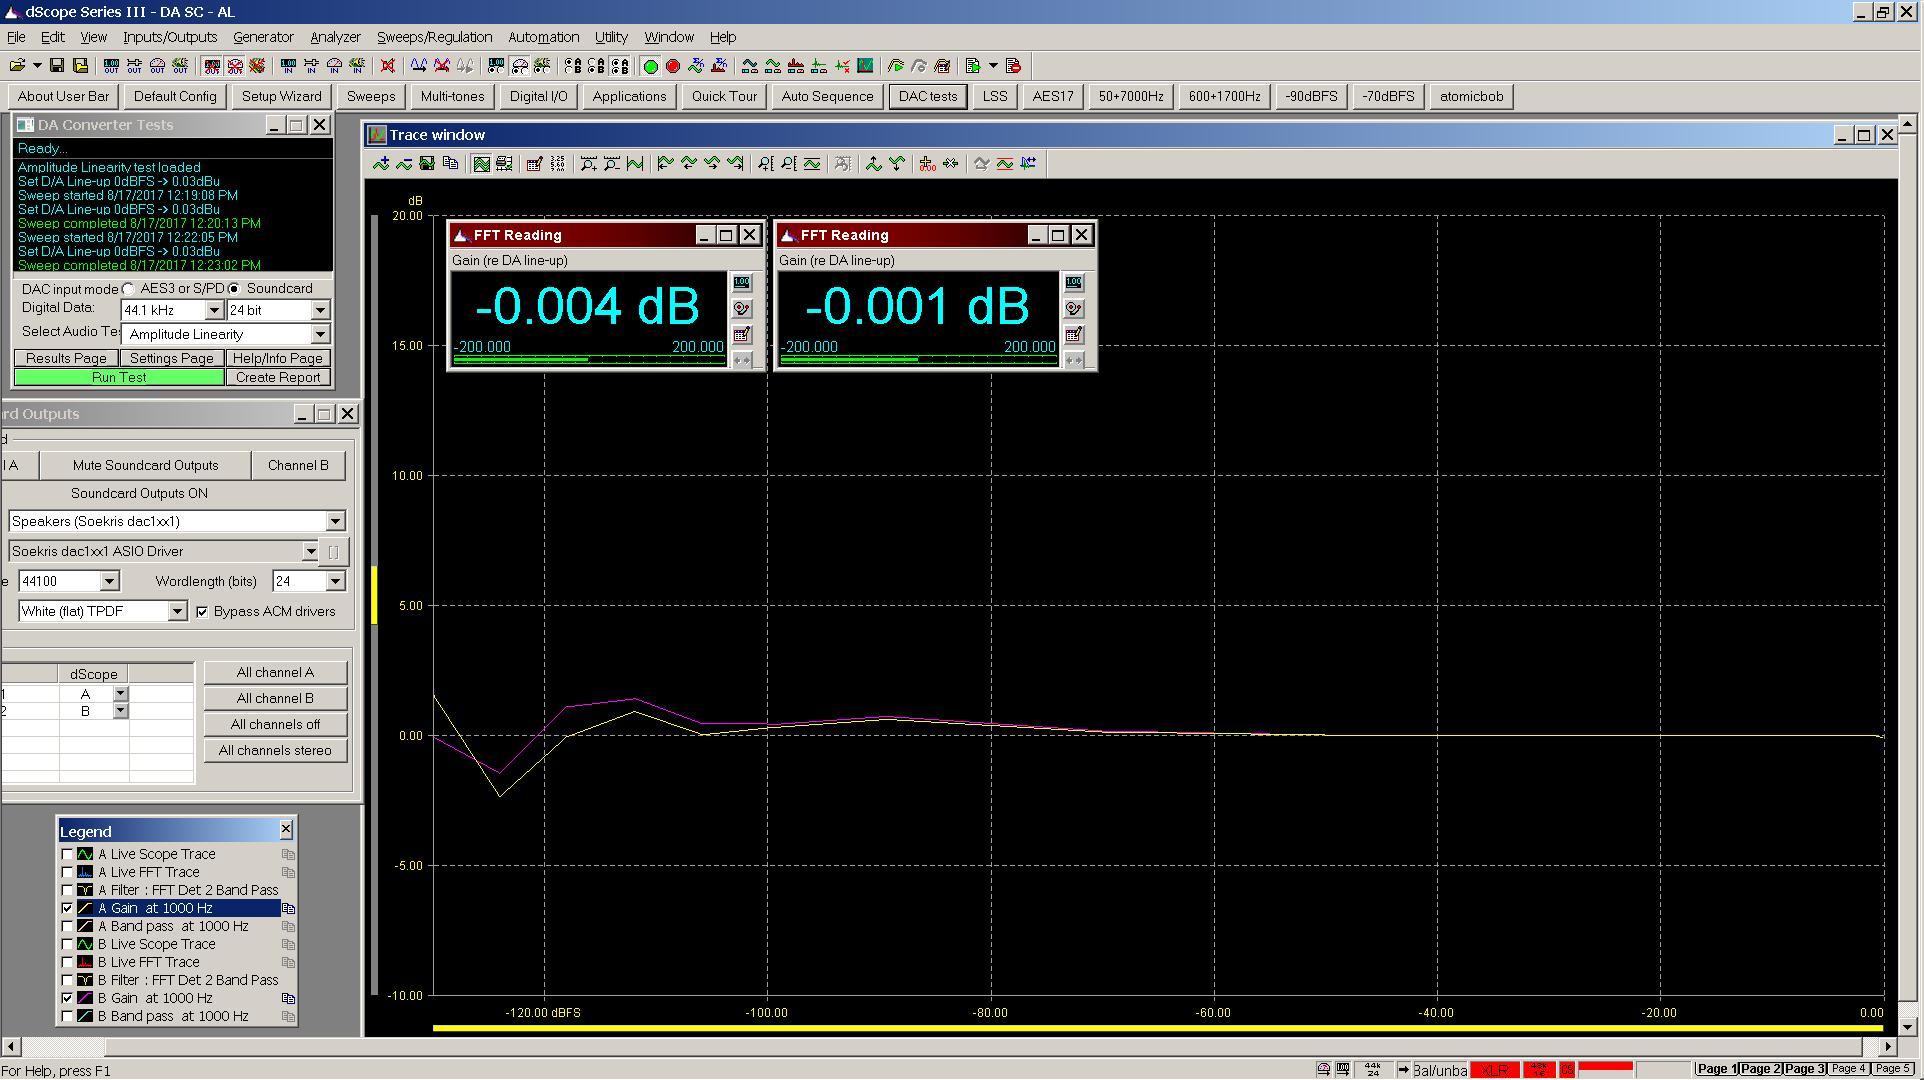 06 Bal 1 KHz gain linearity 300R.PNG